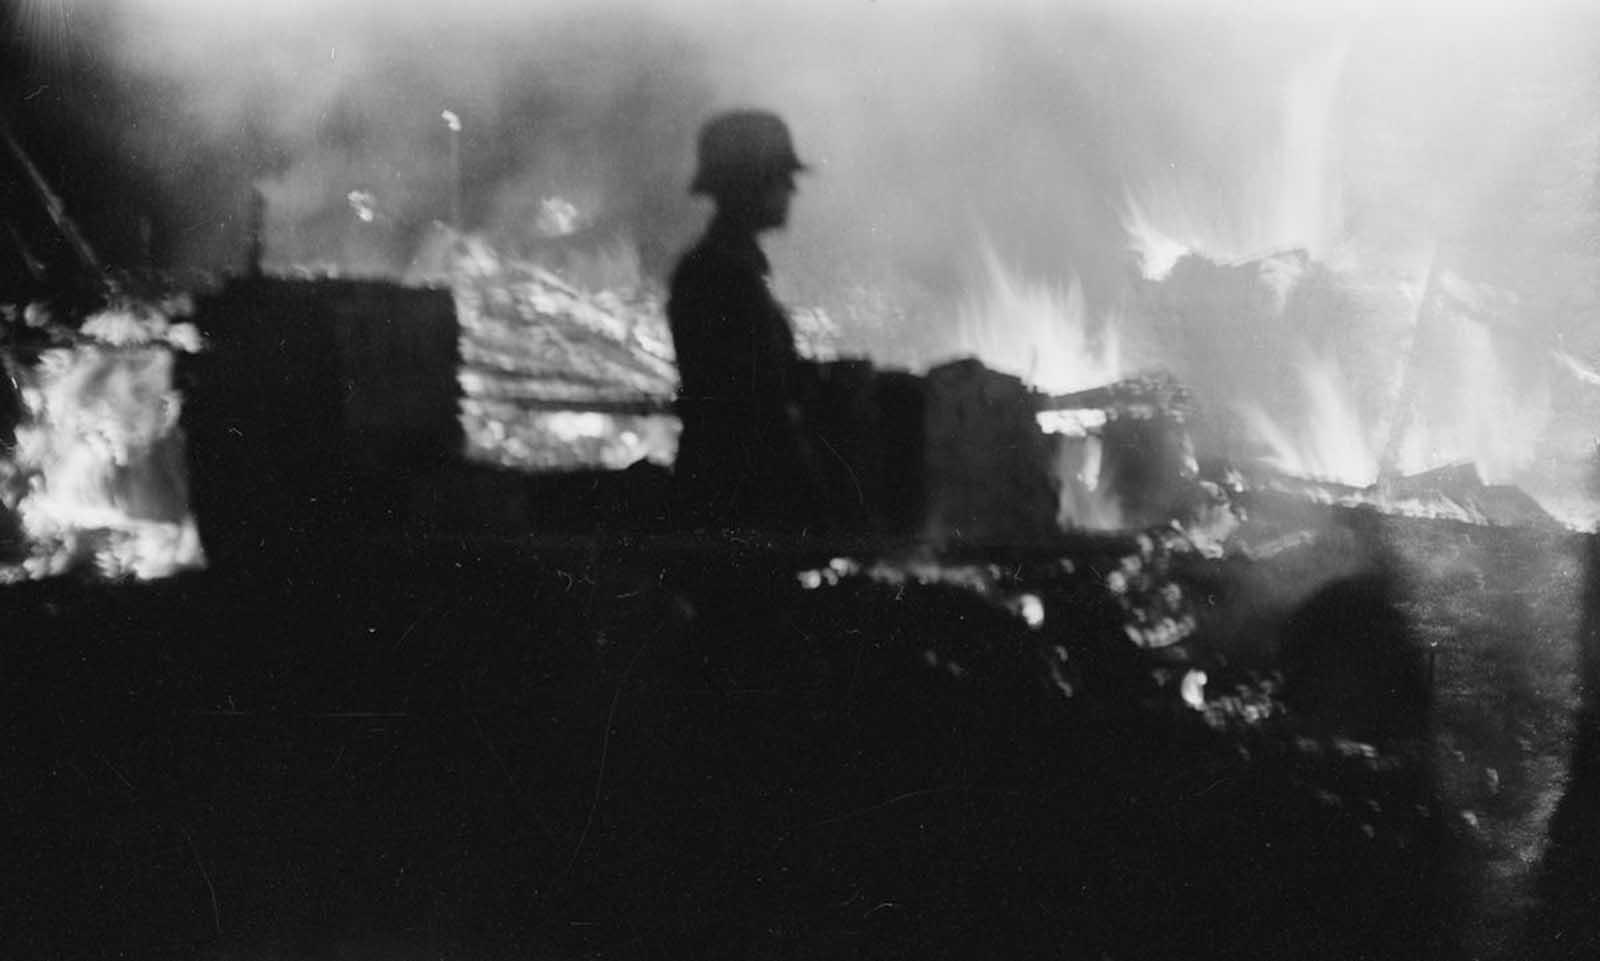 German ammunition depot explosion, February 9, 1942.